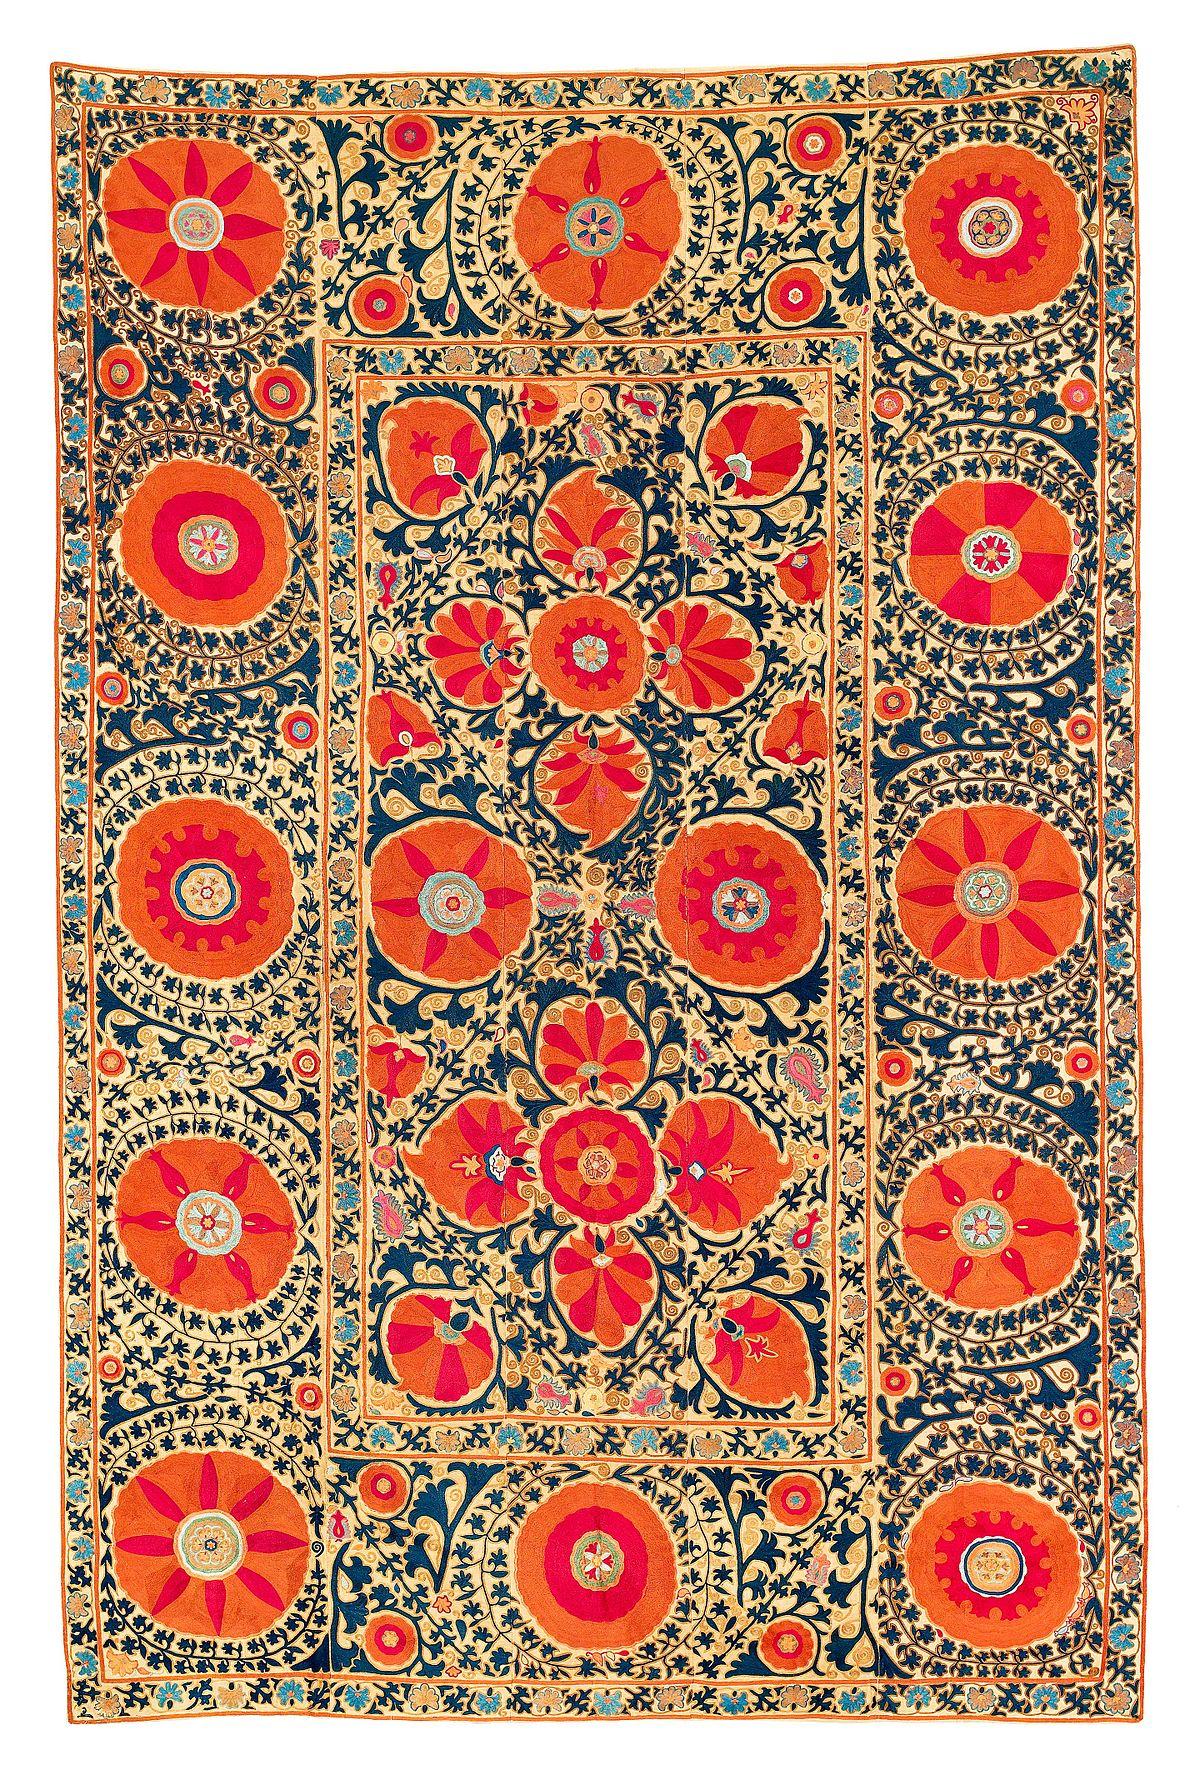 Suzani Textile Wikipedia